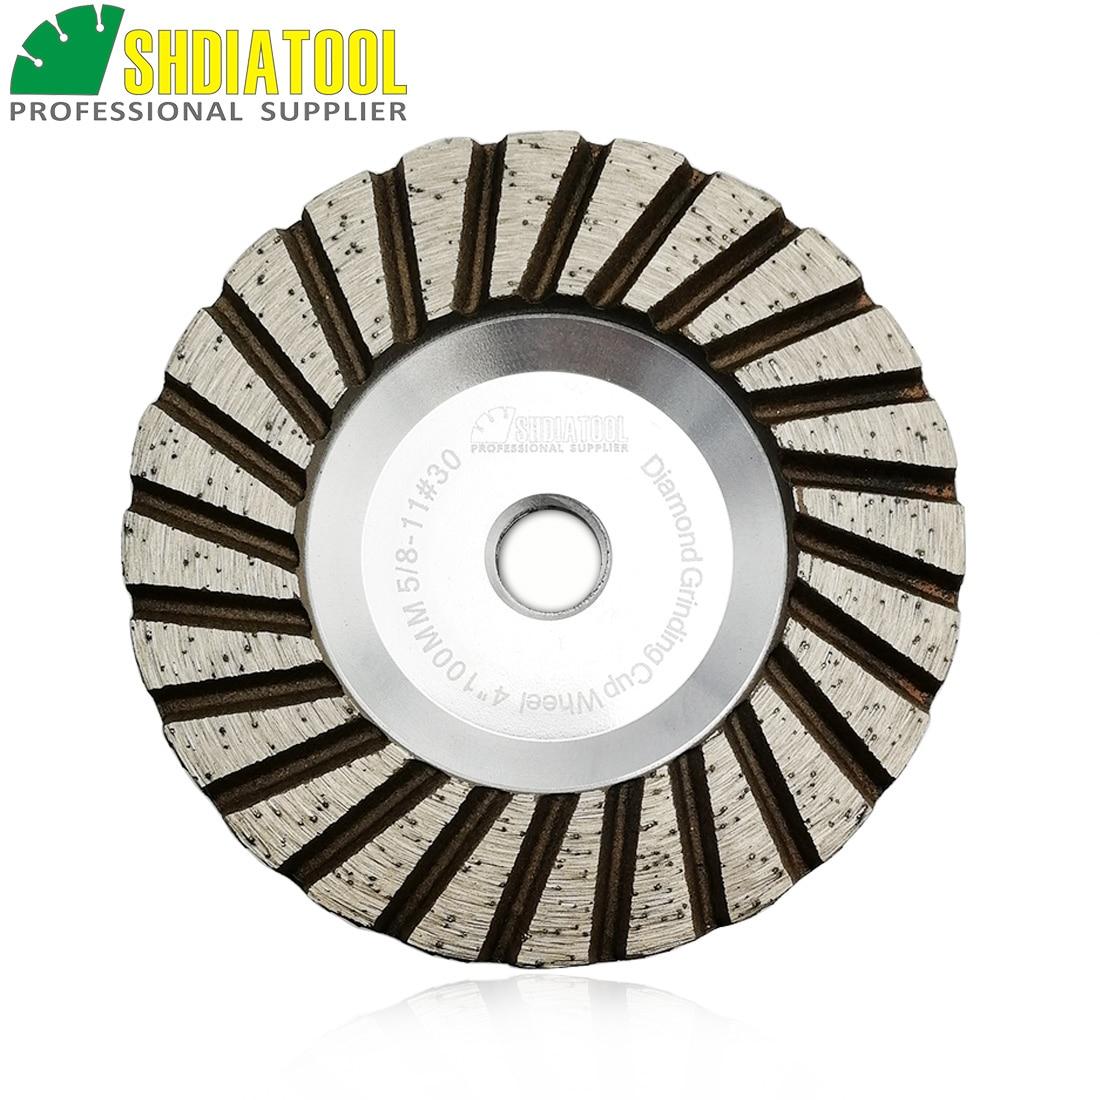 Rebolo de Moagem 100mm de Alumínio Shdiatool Diâmetro 4 Baseado Diamante Copo Disco Granito Mármore Rebolo 1pc 5 – 8-11